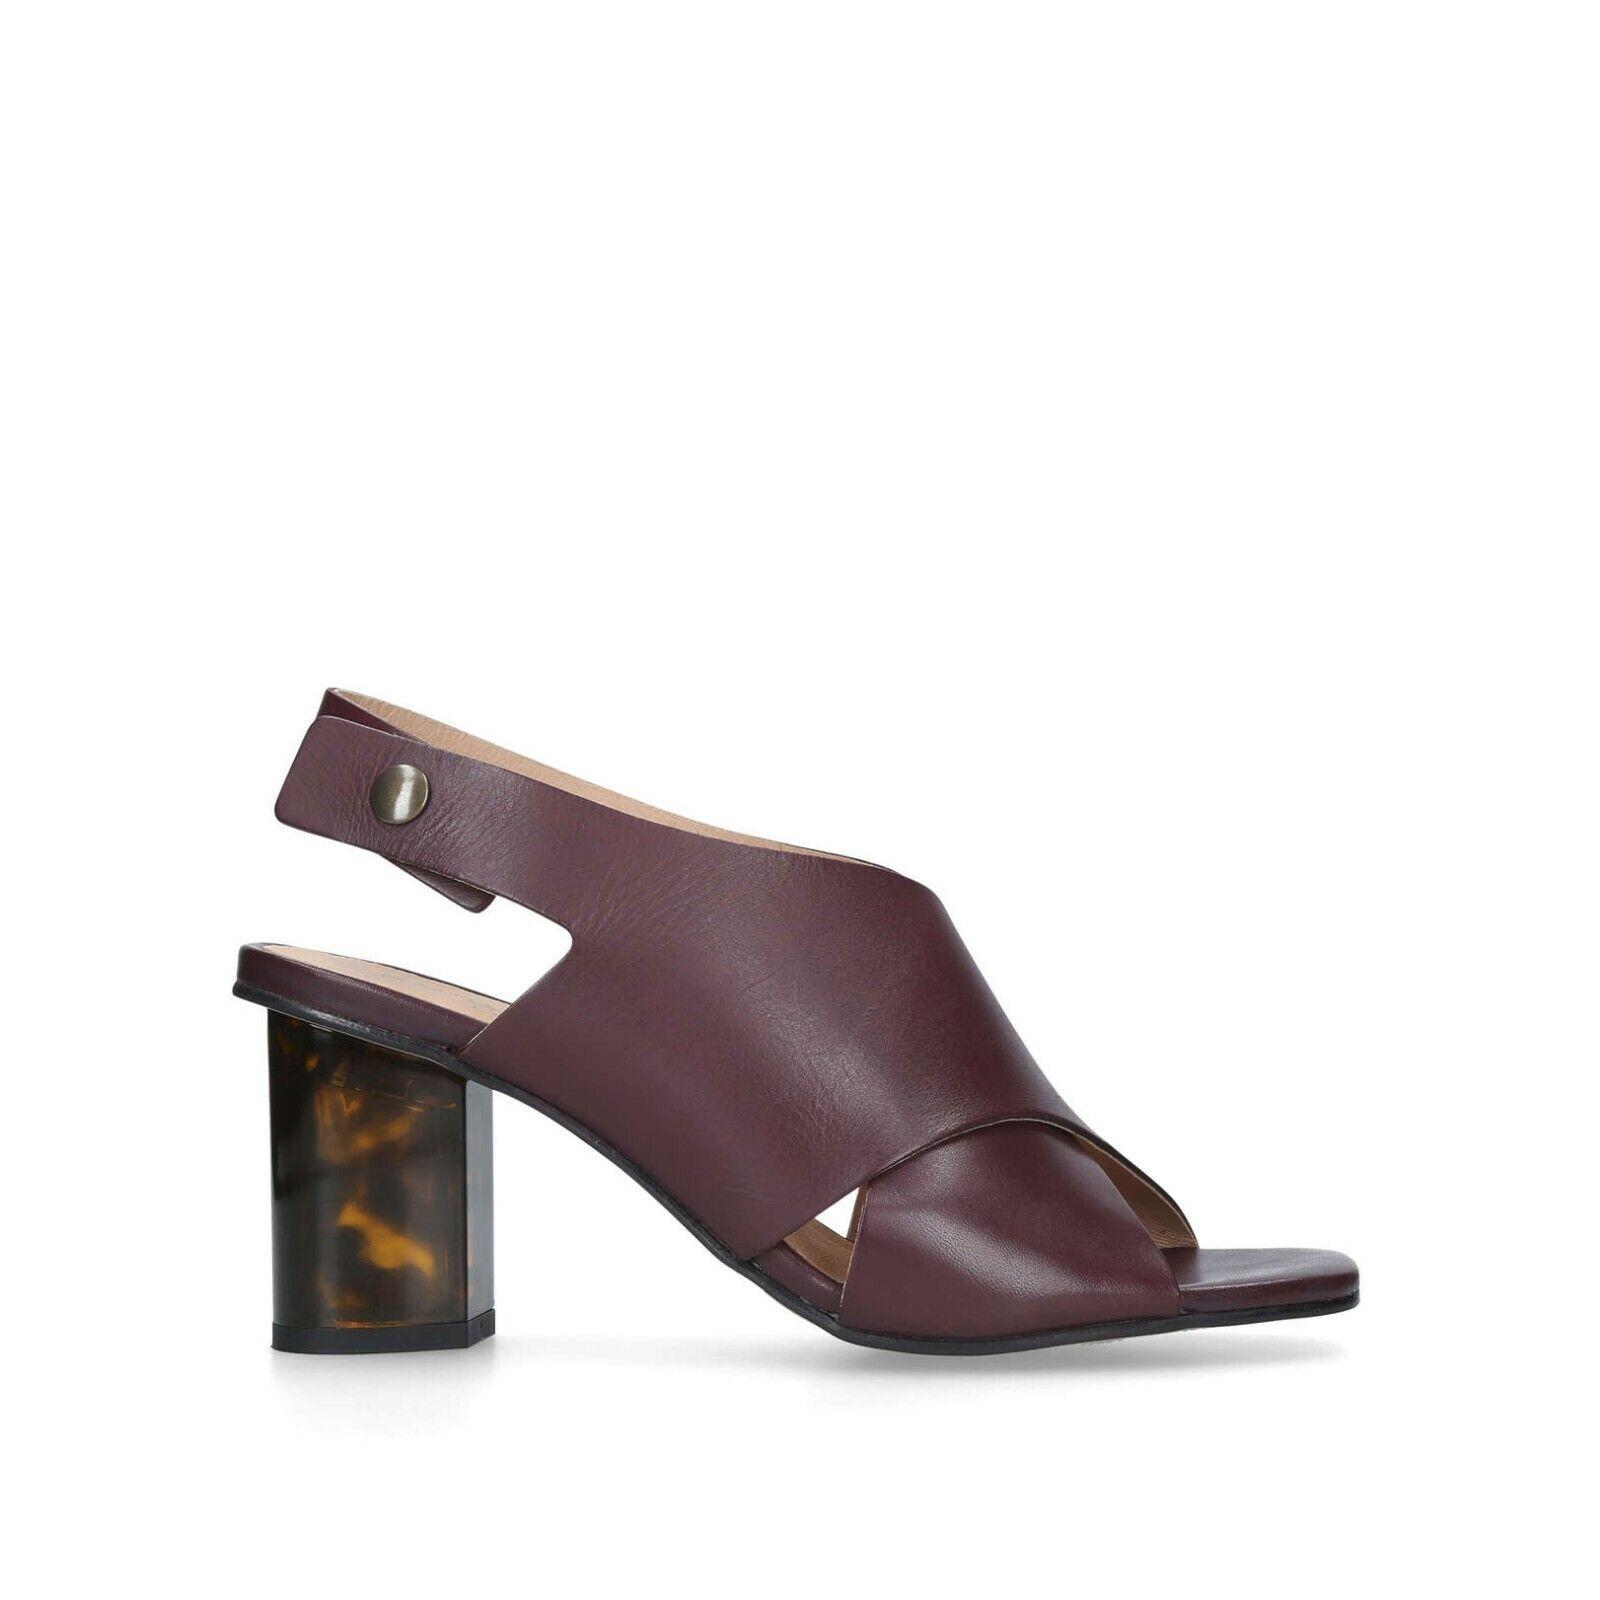 Kurt Geiger London Wine Leather Summer Sandals Size 5   38   New in Box